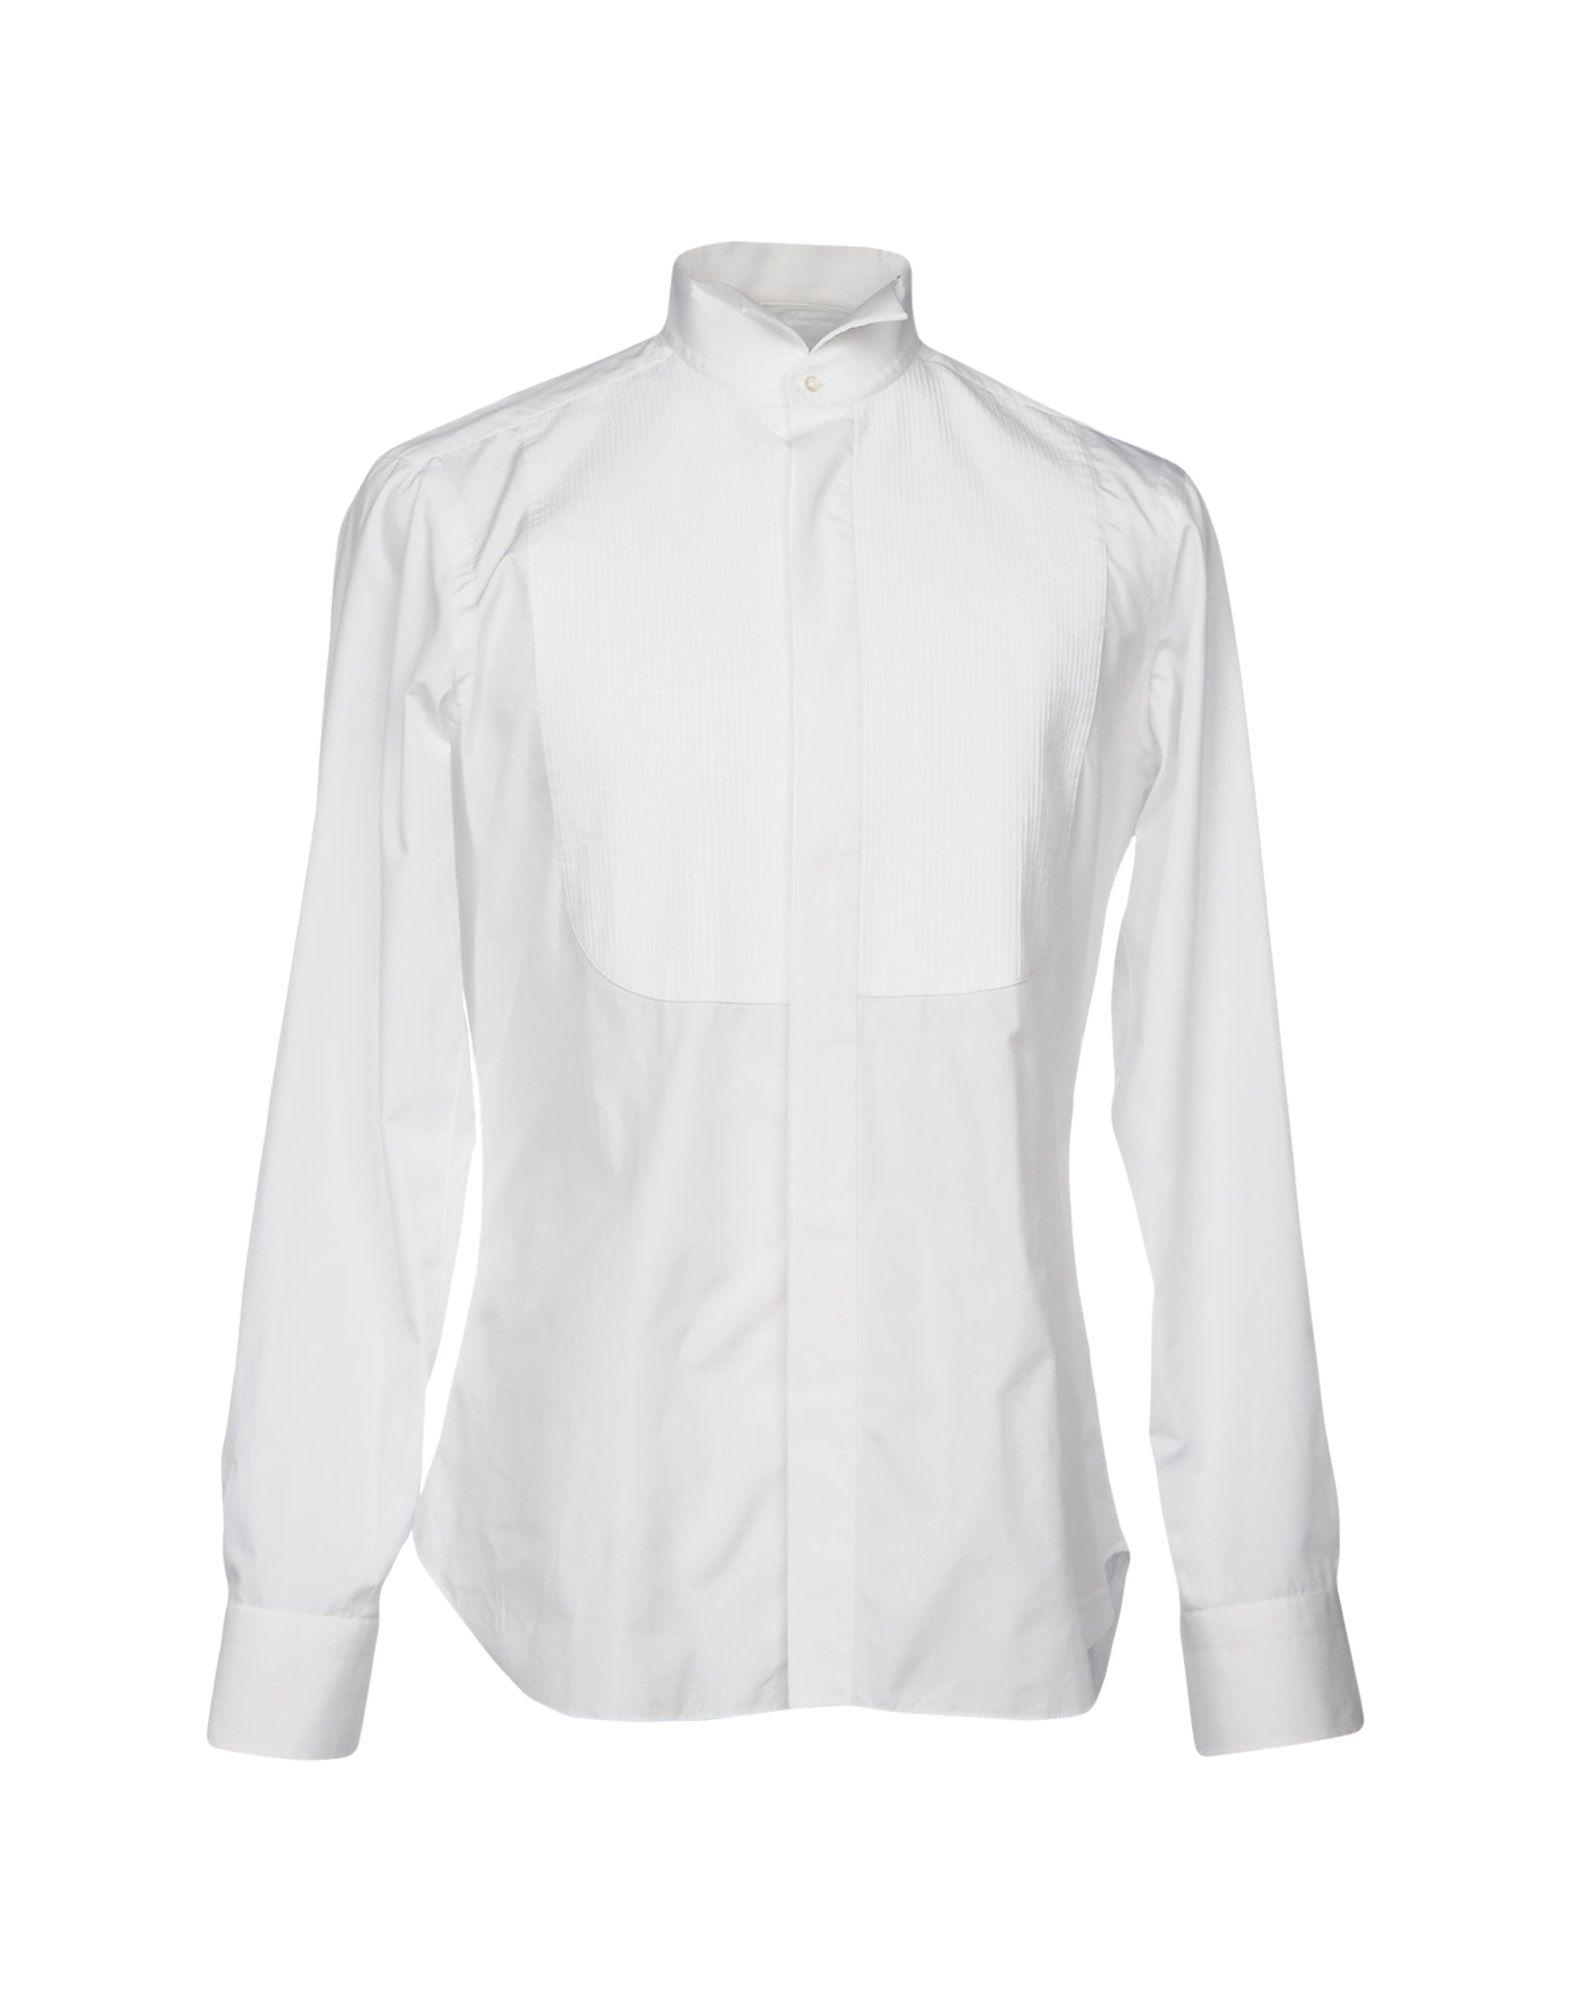 BARBA NAPOLI Solid Color Shirt in White